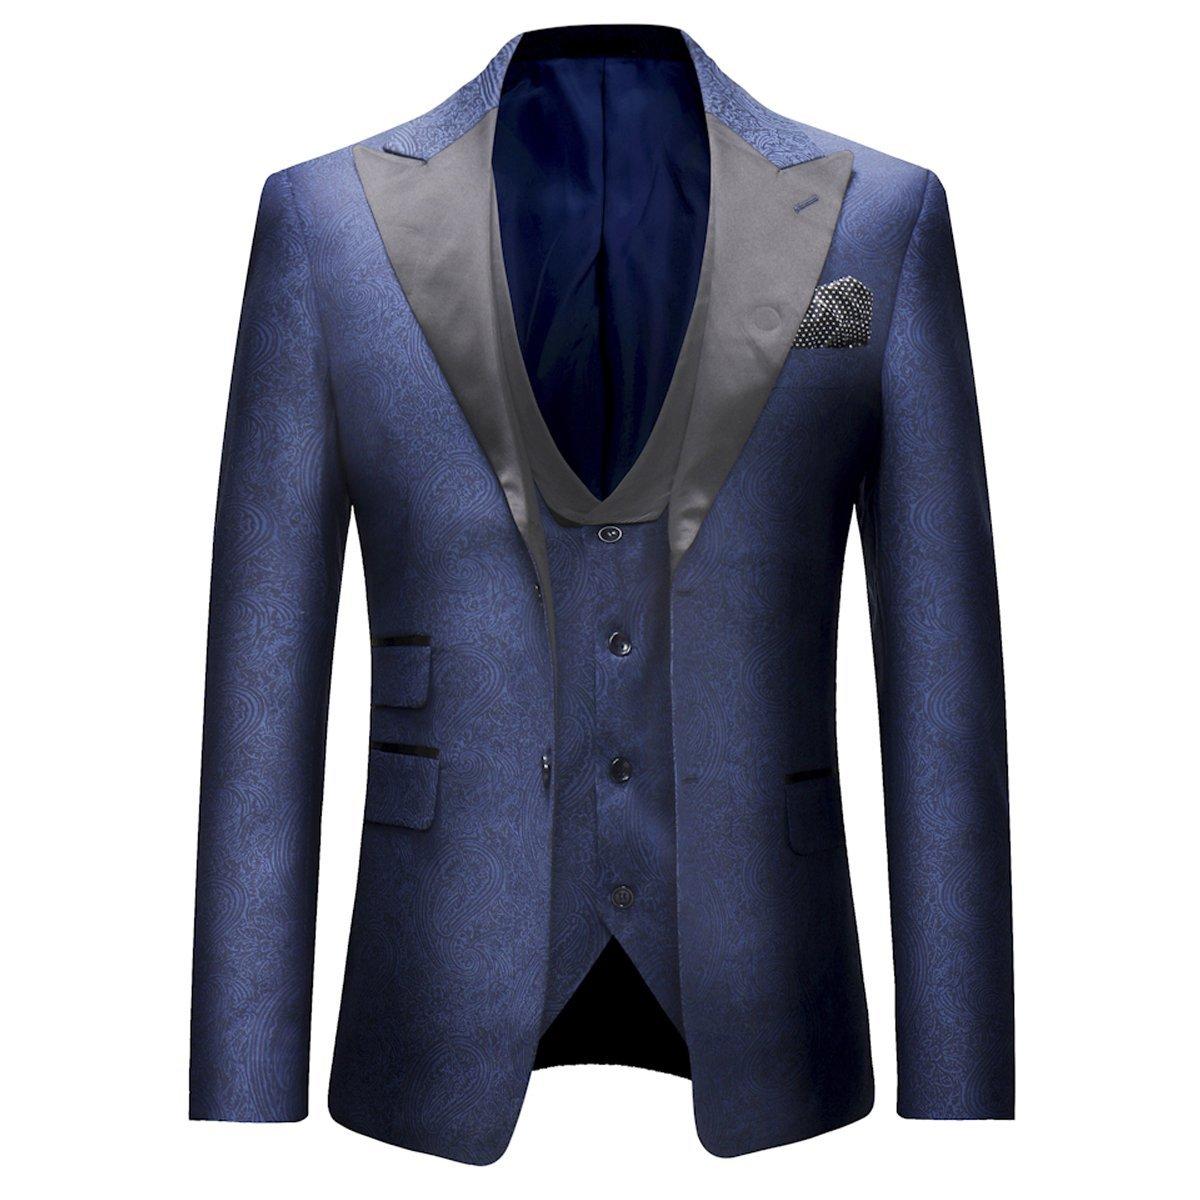 0a2f877ba9 Boyland Mens 3 Piece Tuxedo Suits Jacquard Wedding Formal Wear Trouser at  Amazon Men's Clothing store: